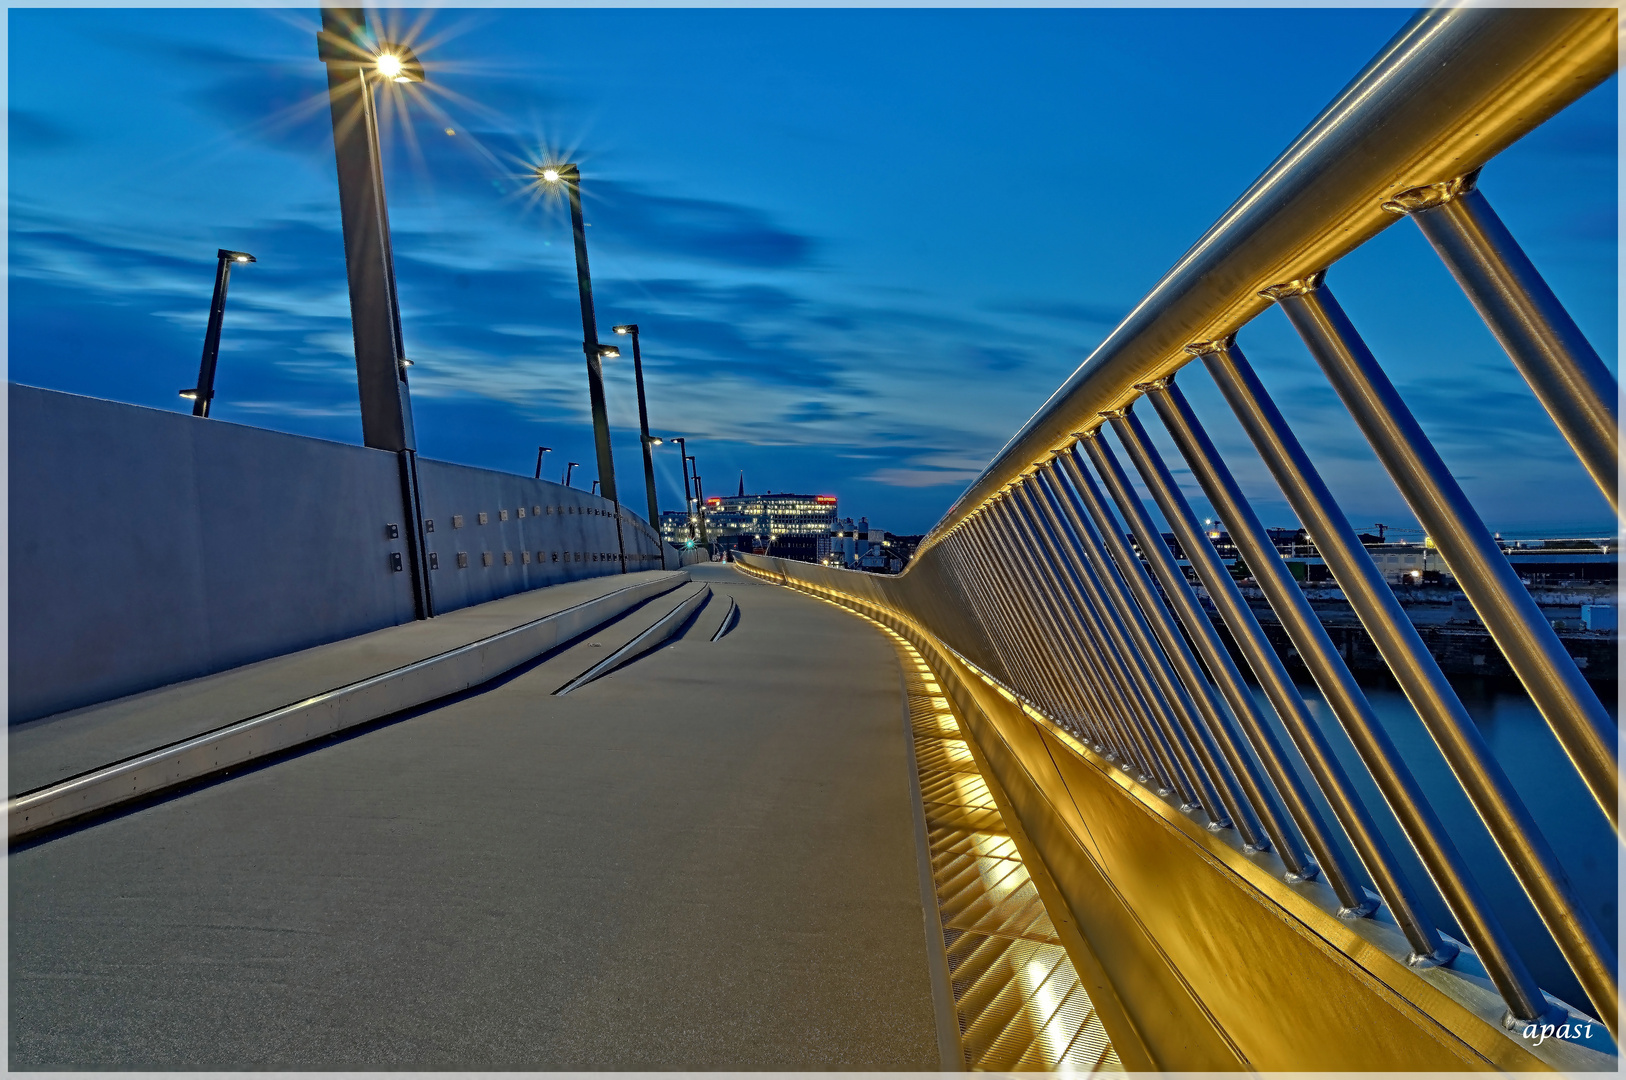 Swing in the Bridge